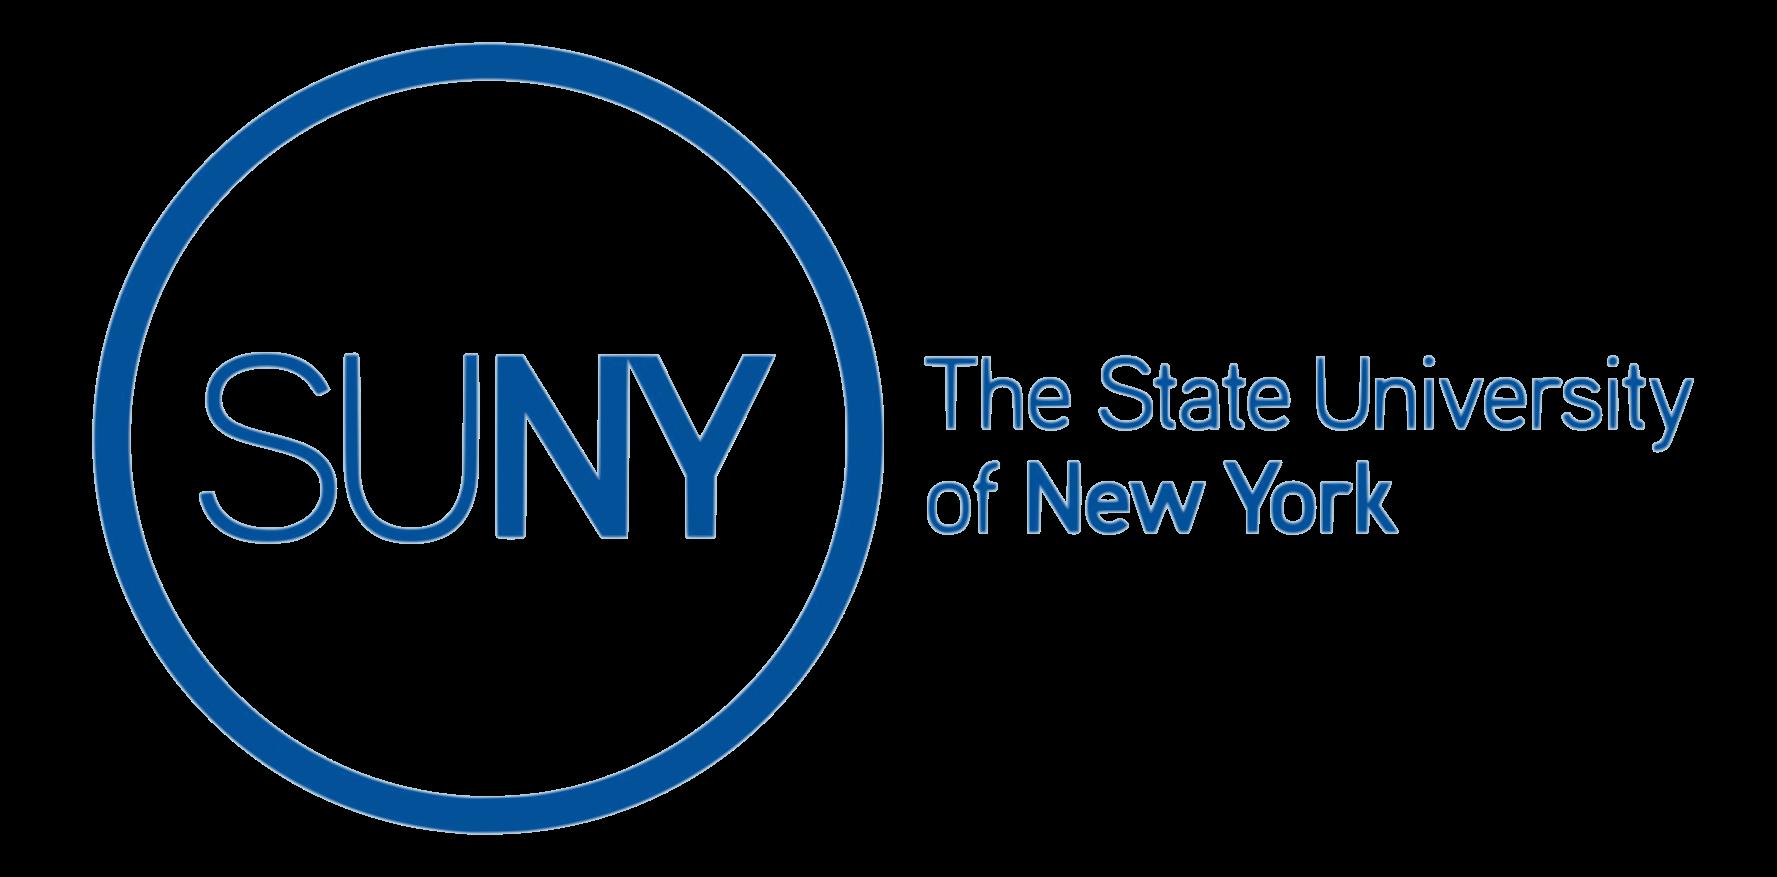 SUNY Logo_404921